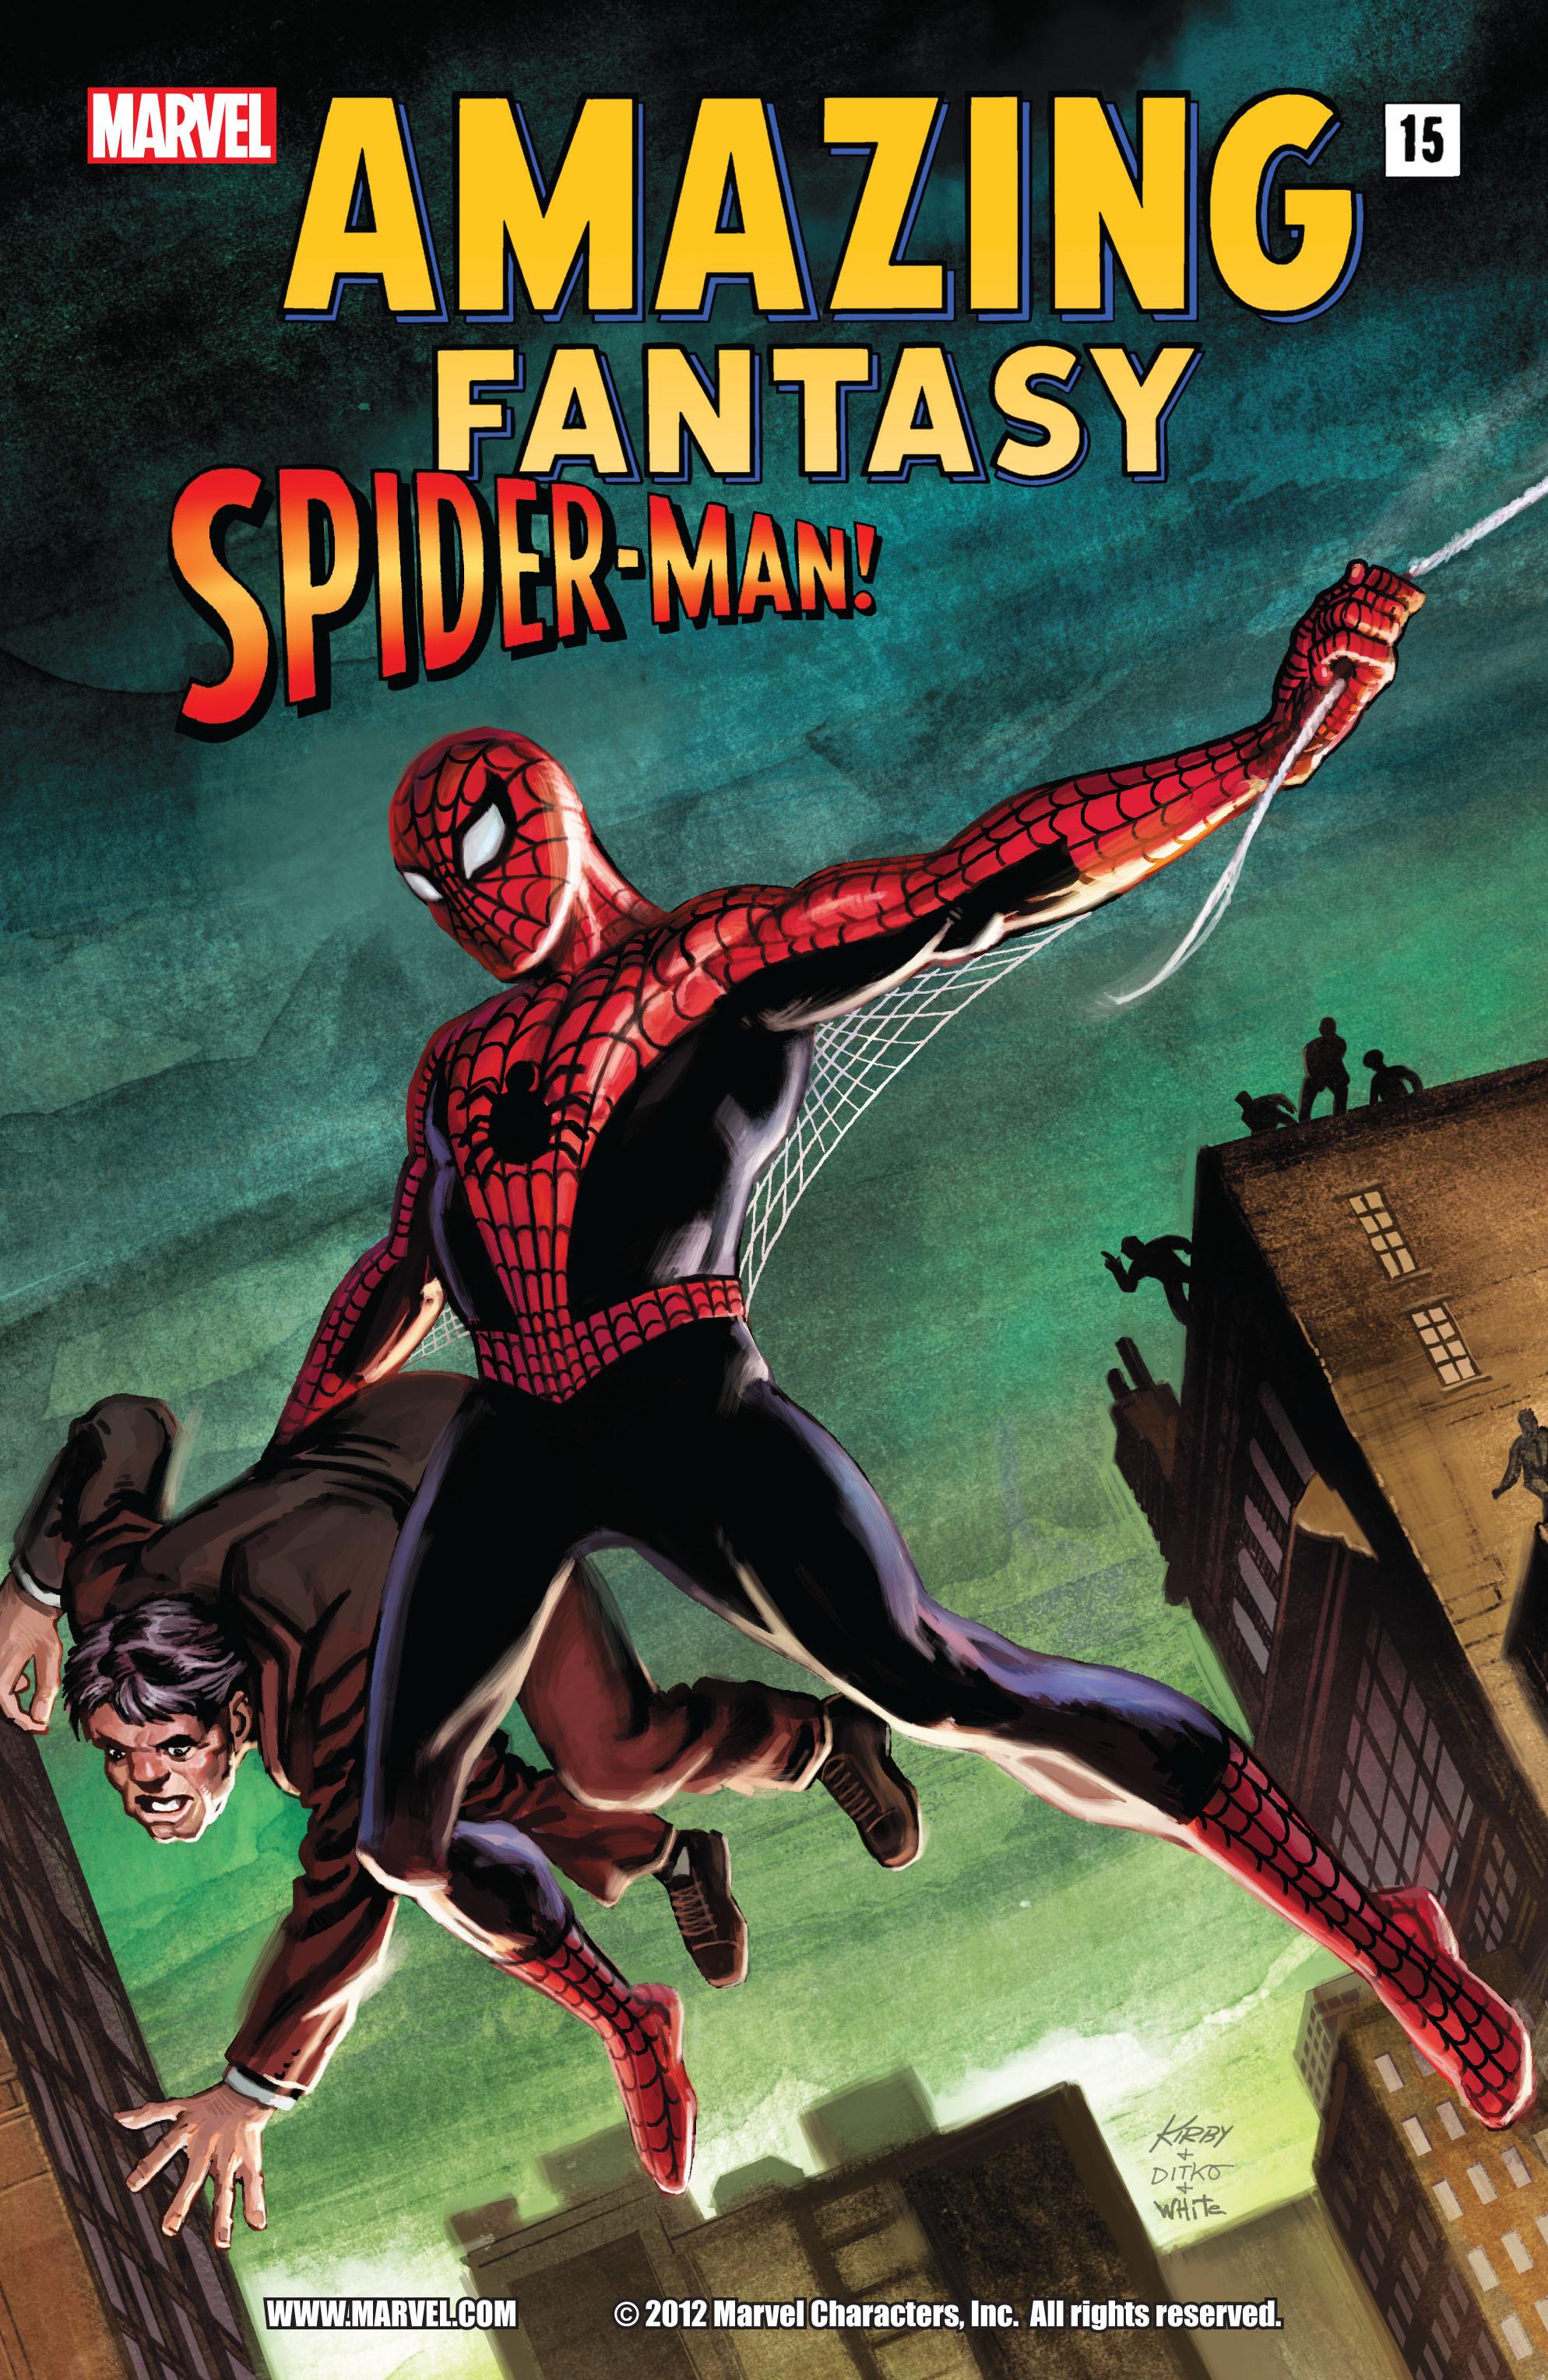 Amazing Fantasy #15: Spider-Man! Full Page 1